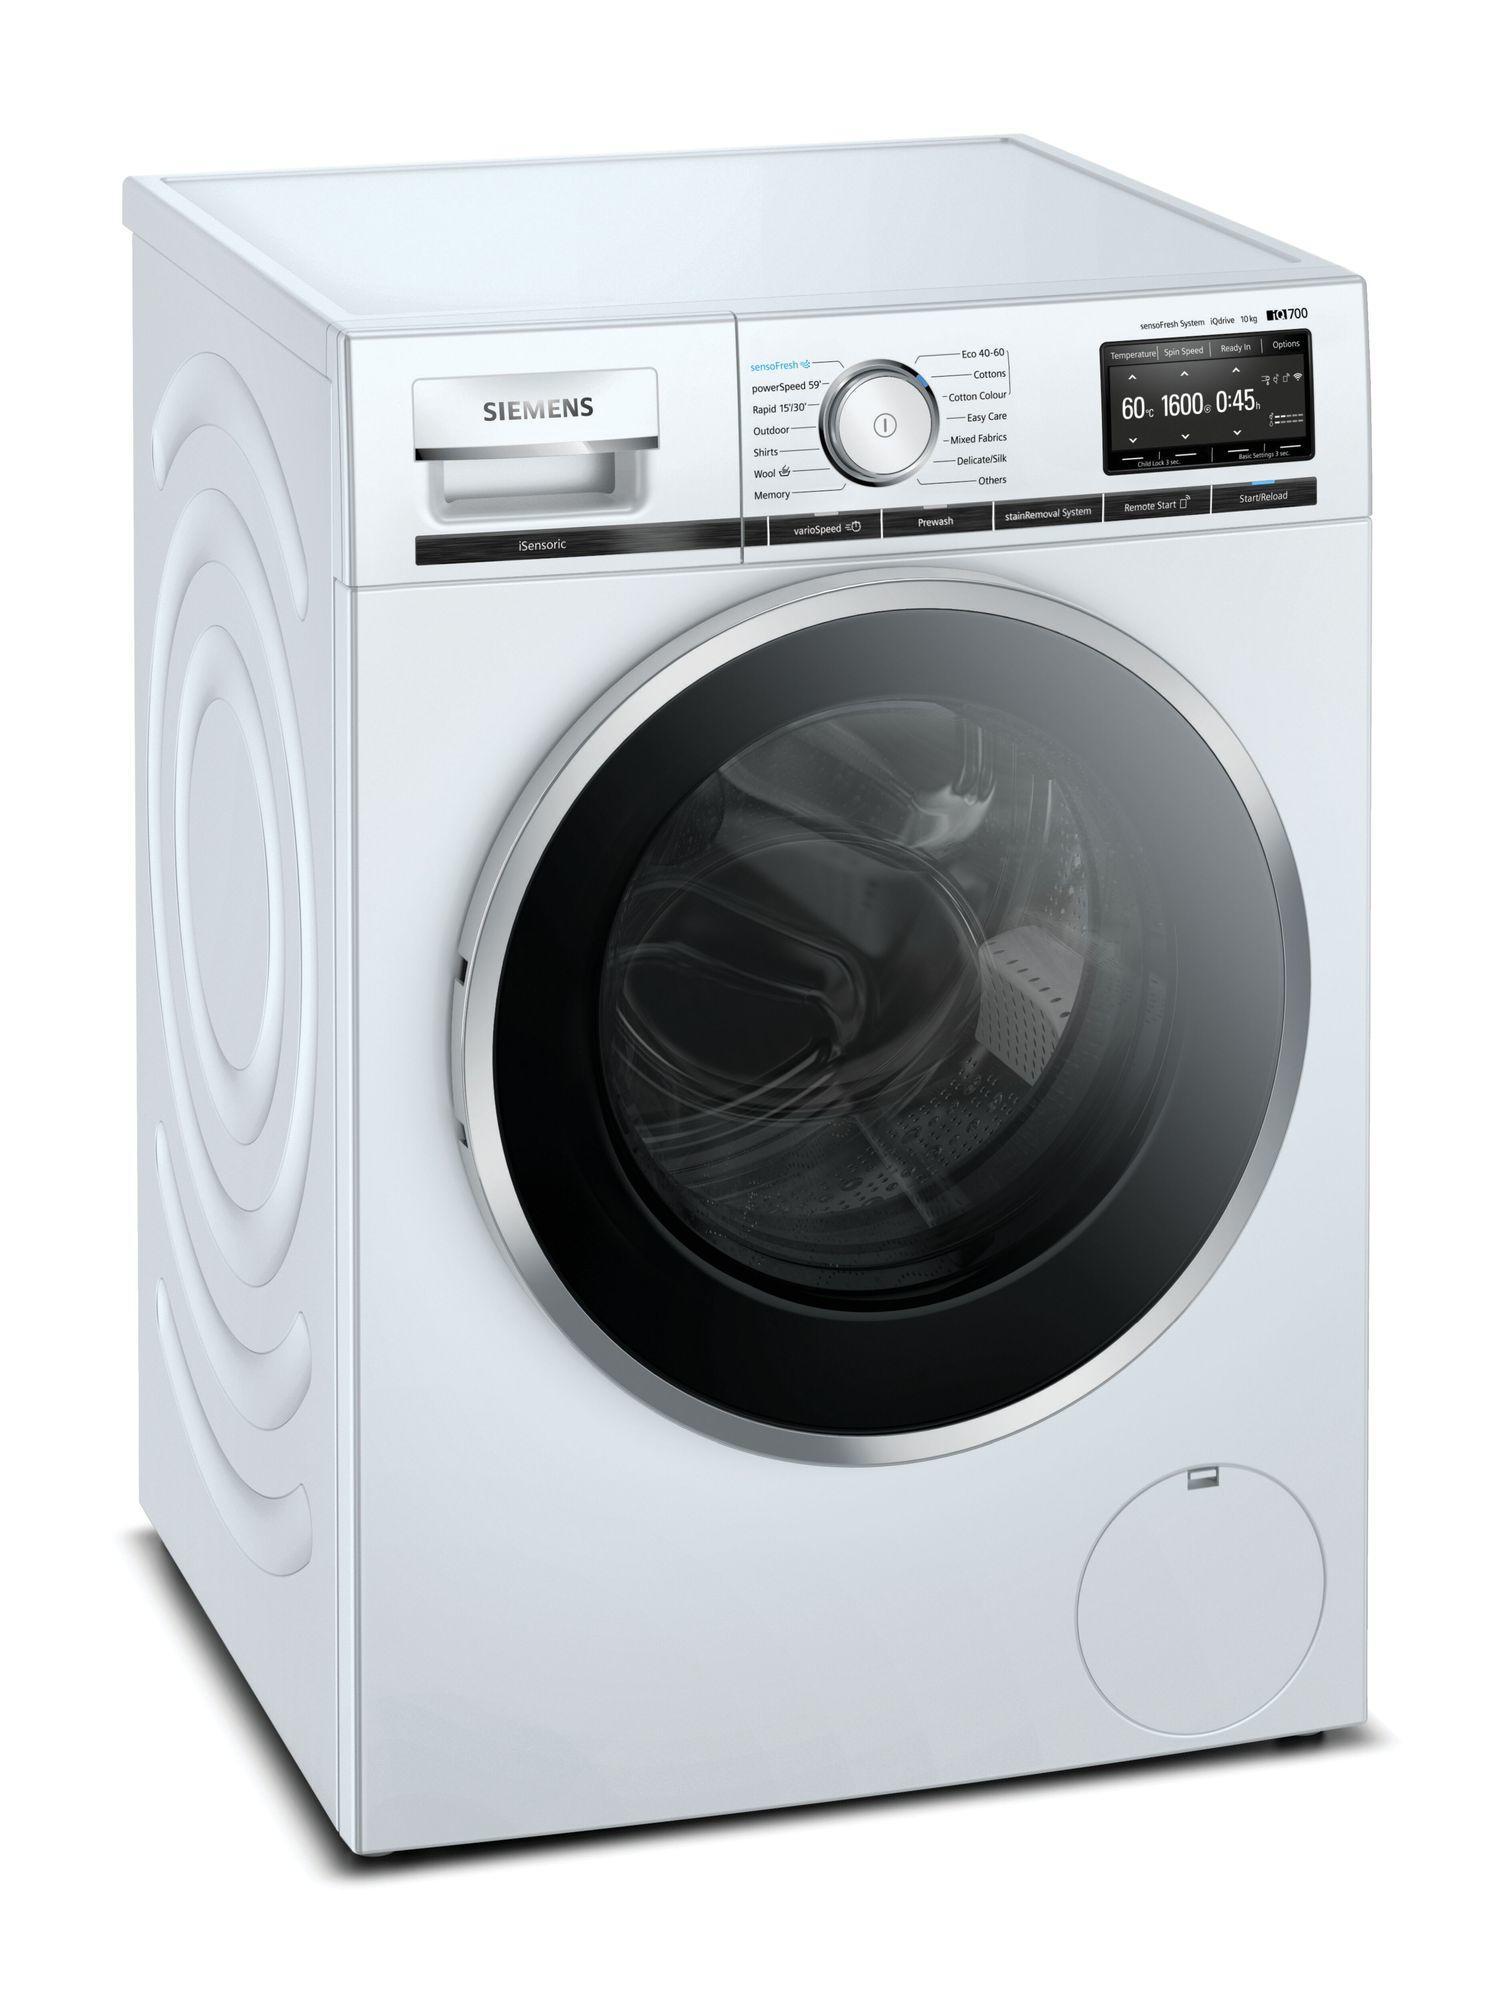 Washing Machines iQ700 WM16XFH5GB 10Kg 1600 Spin Washing Machine | White